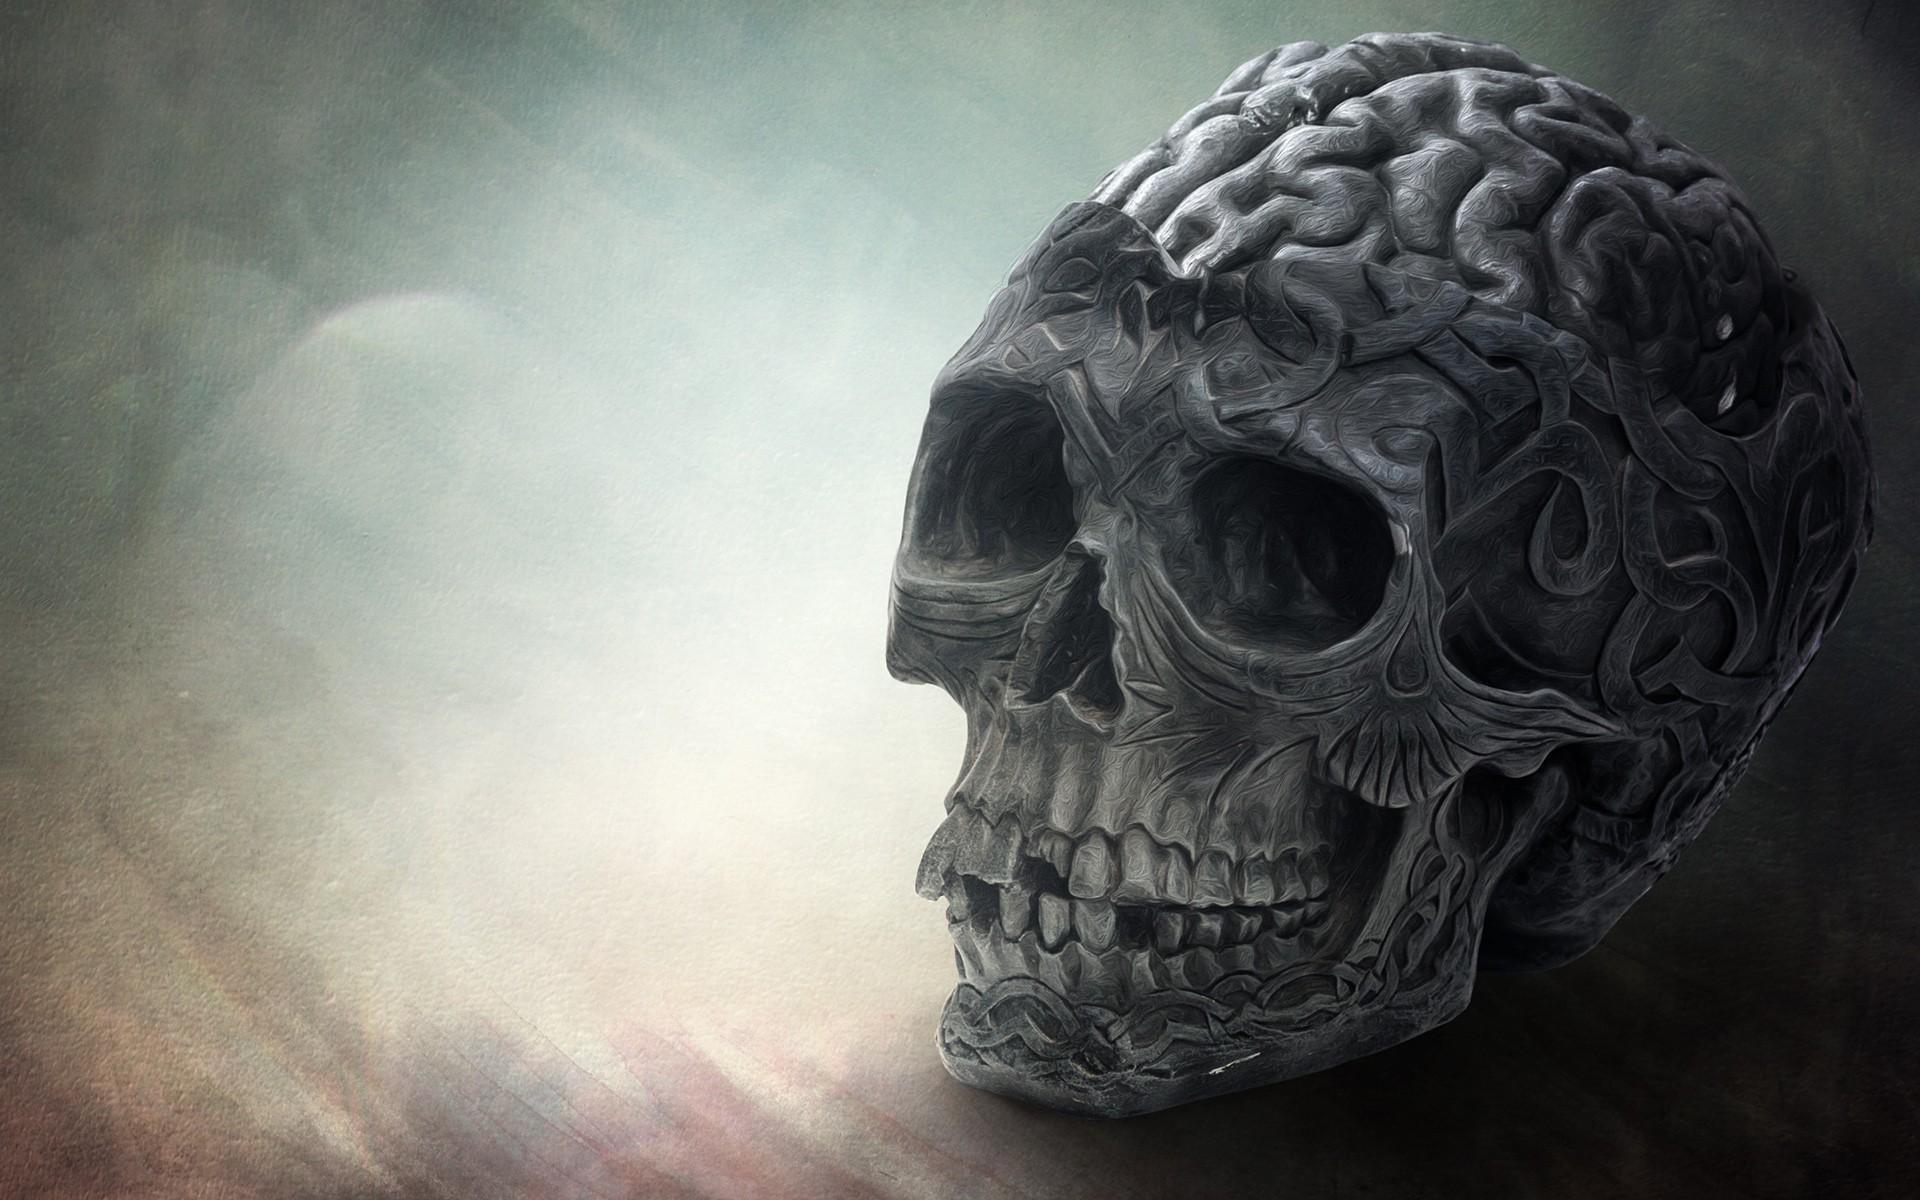 Brain Wallpaper 1 Download Free Beautiful Backgrounds For Desktop